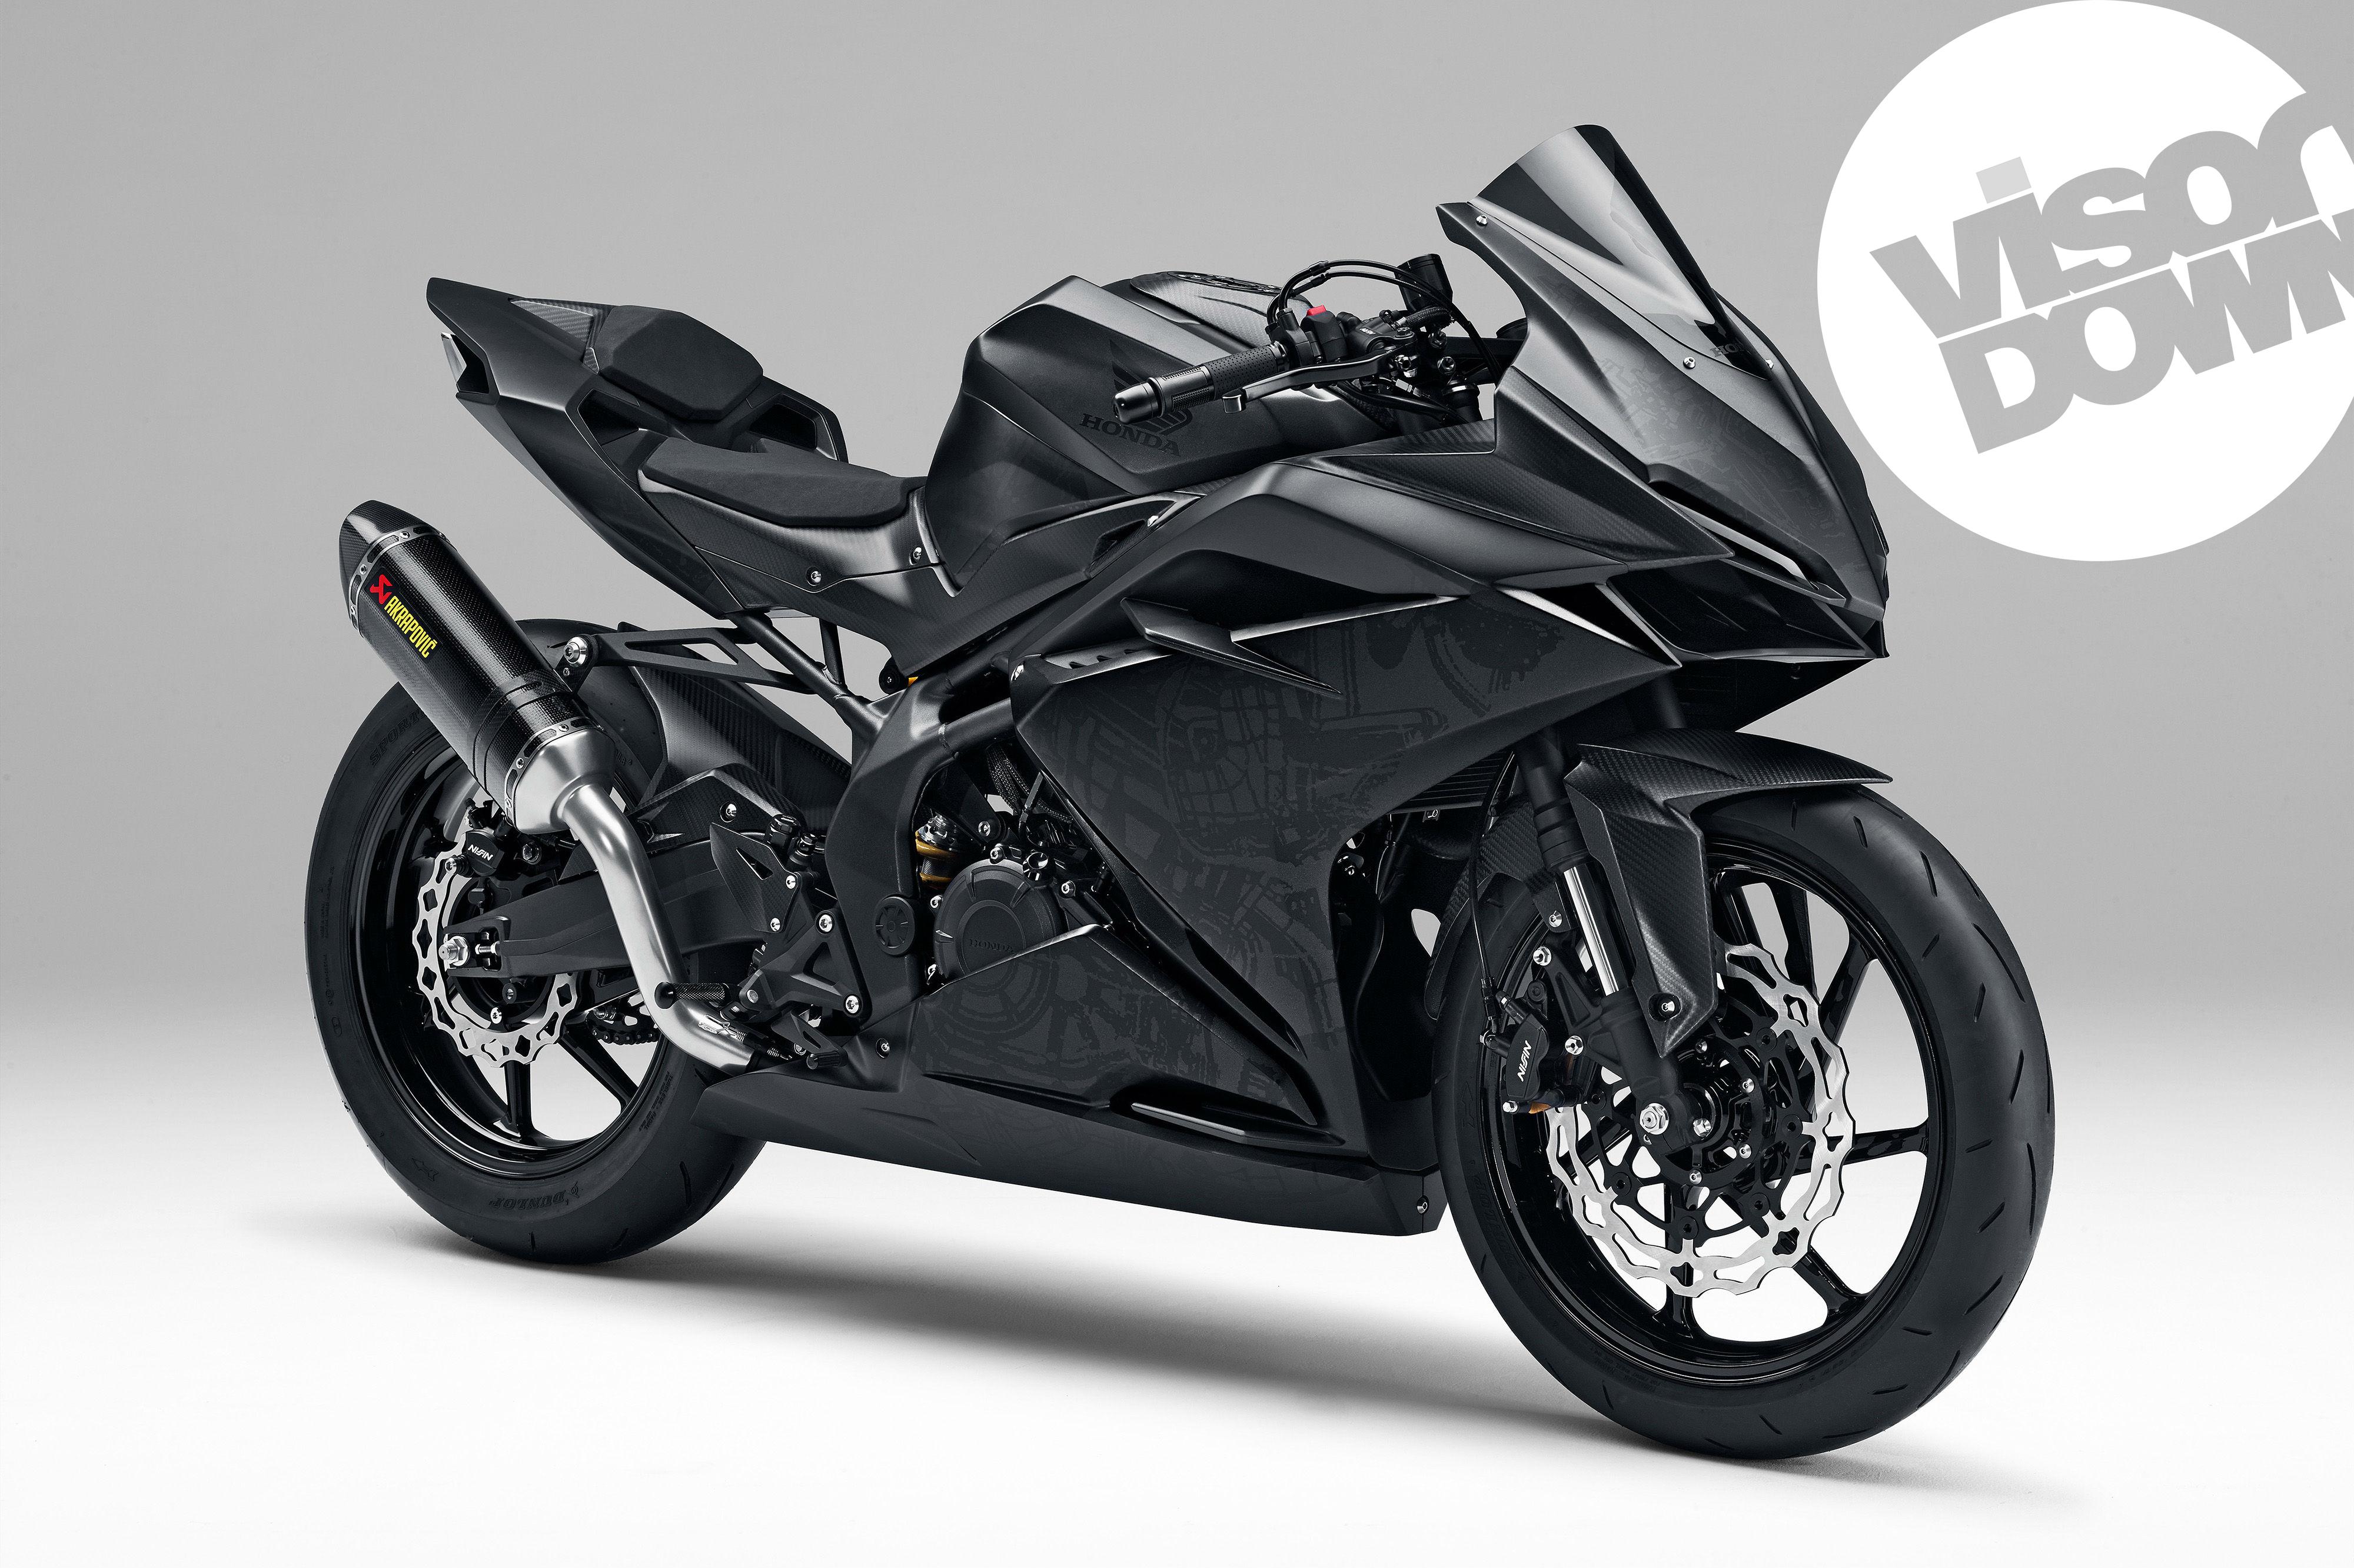 Here's a closer look round Honda's CBR250RR concept bike